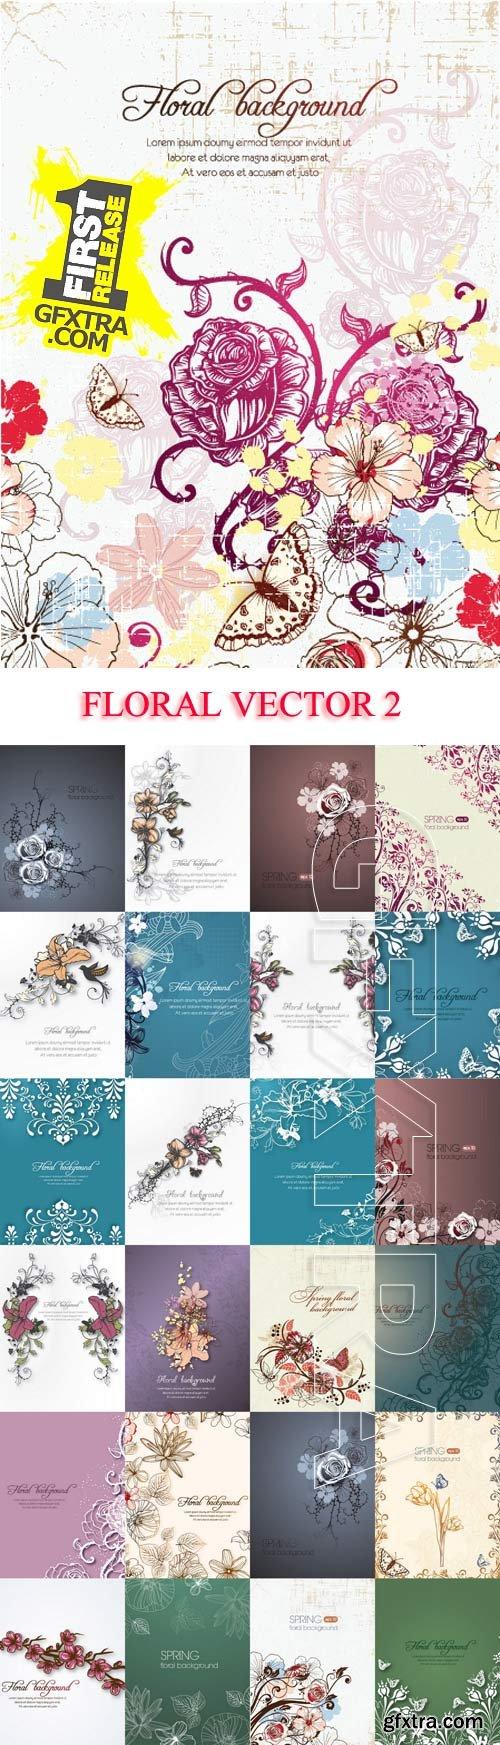 Vectorious Floral Illustrations Set 2, 25xEPS